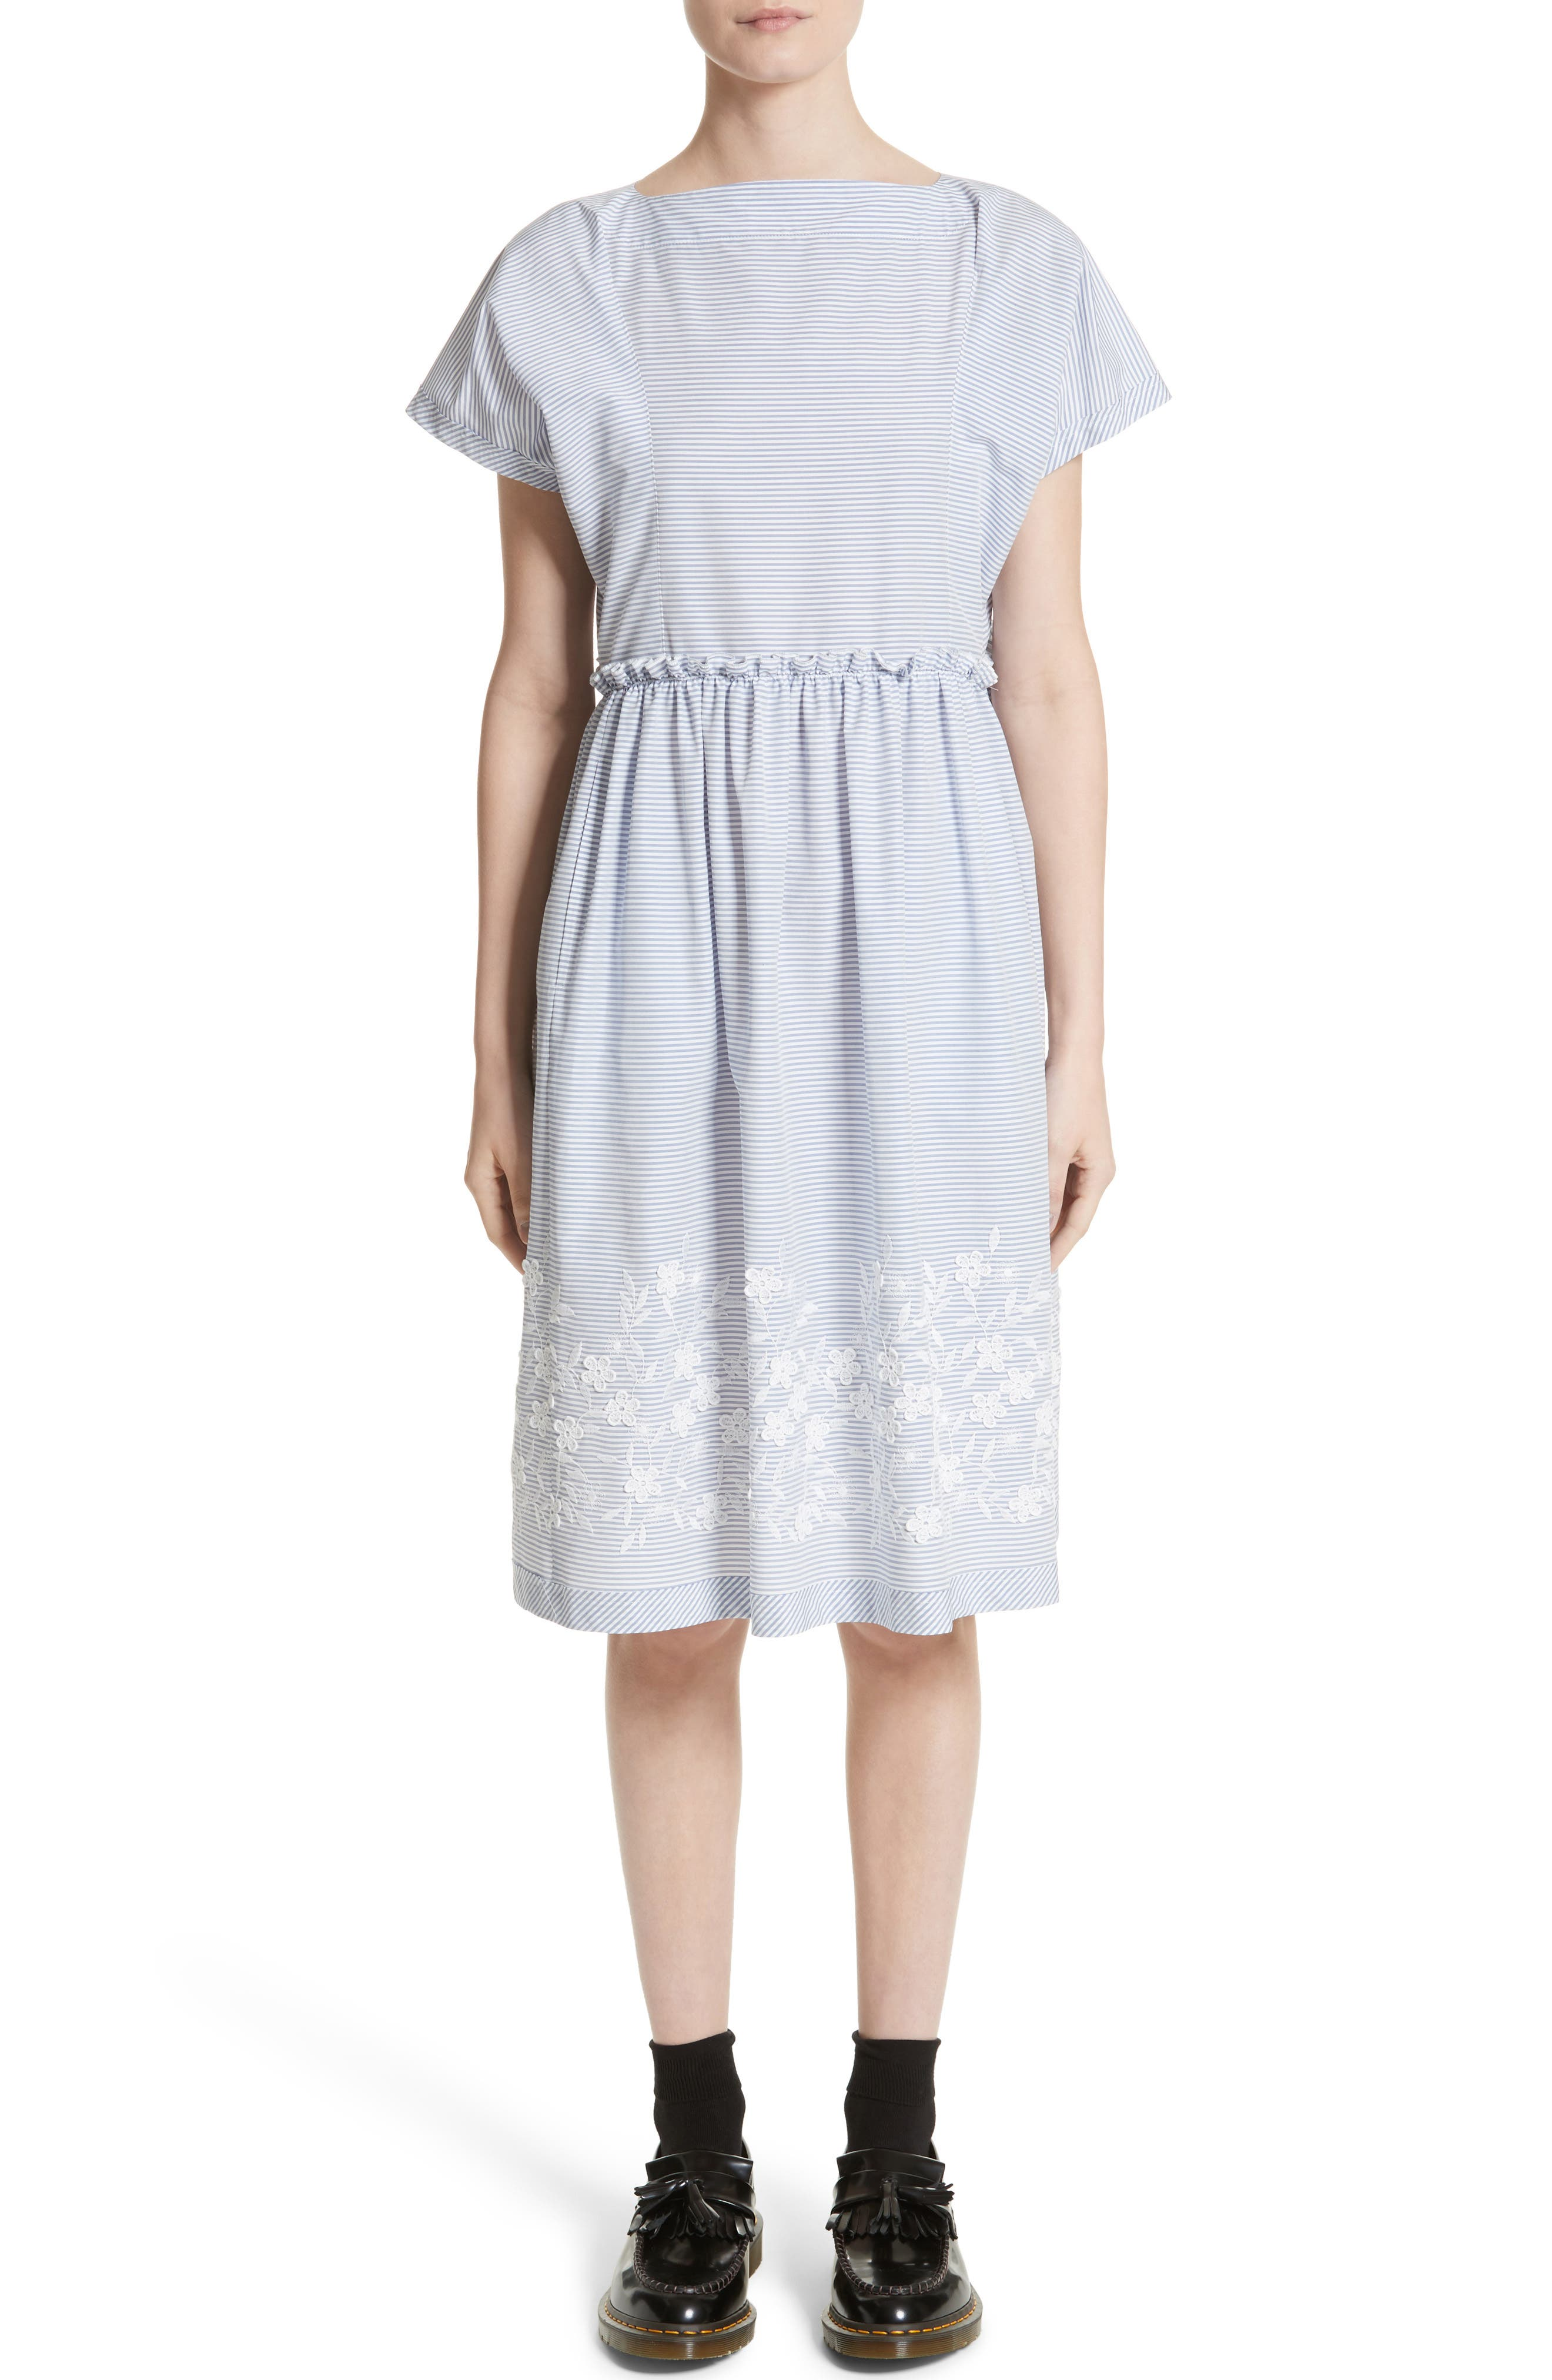 Main Image - Tricot Comme des Garçons Floral Embroidered Stripe Shift Dress